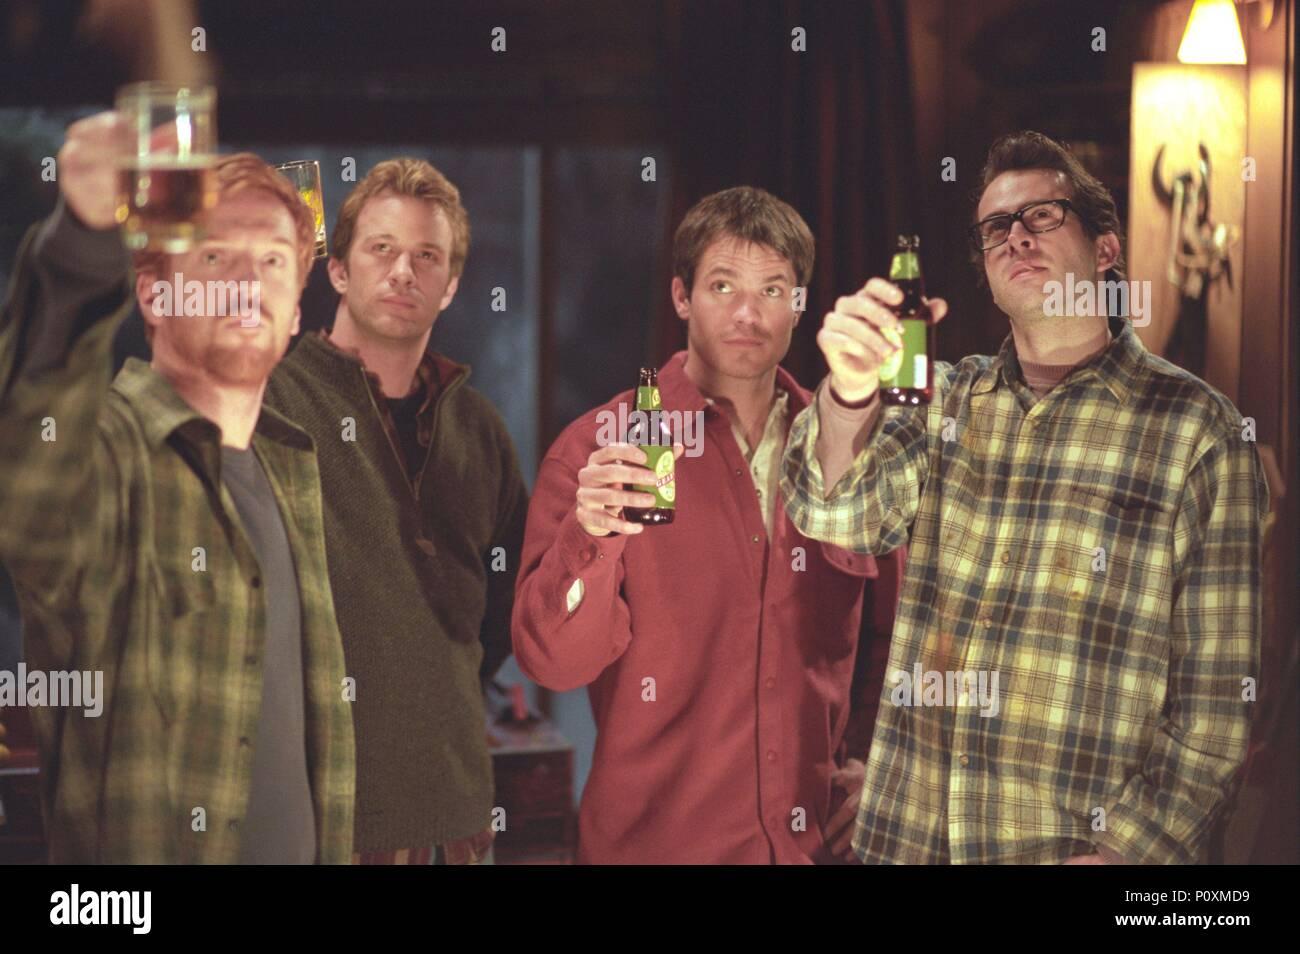 Original Film Title: DREAMCATCHER.  English Title: DREAMCATCHER.  Film Director: LAWRENCE KASDAN.  Year: 2003.  Stars: THOMAS JANE; JASON LEE; DAMIAN LEWIS; TIMOTHY OLYPHANT. Credit: WARNER BROS. PICTURES / Album Stock Photo